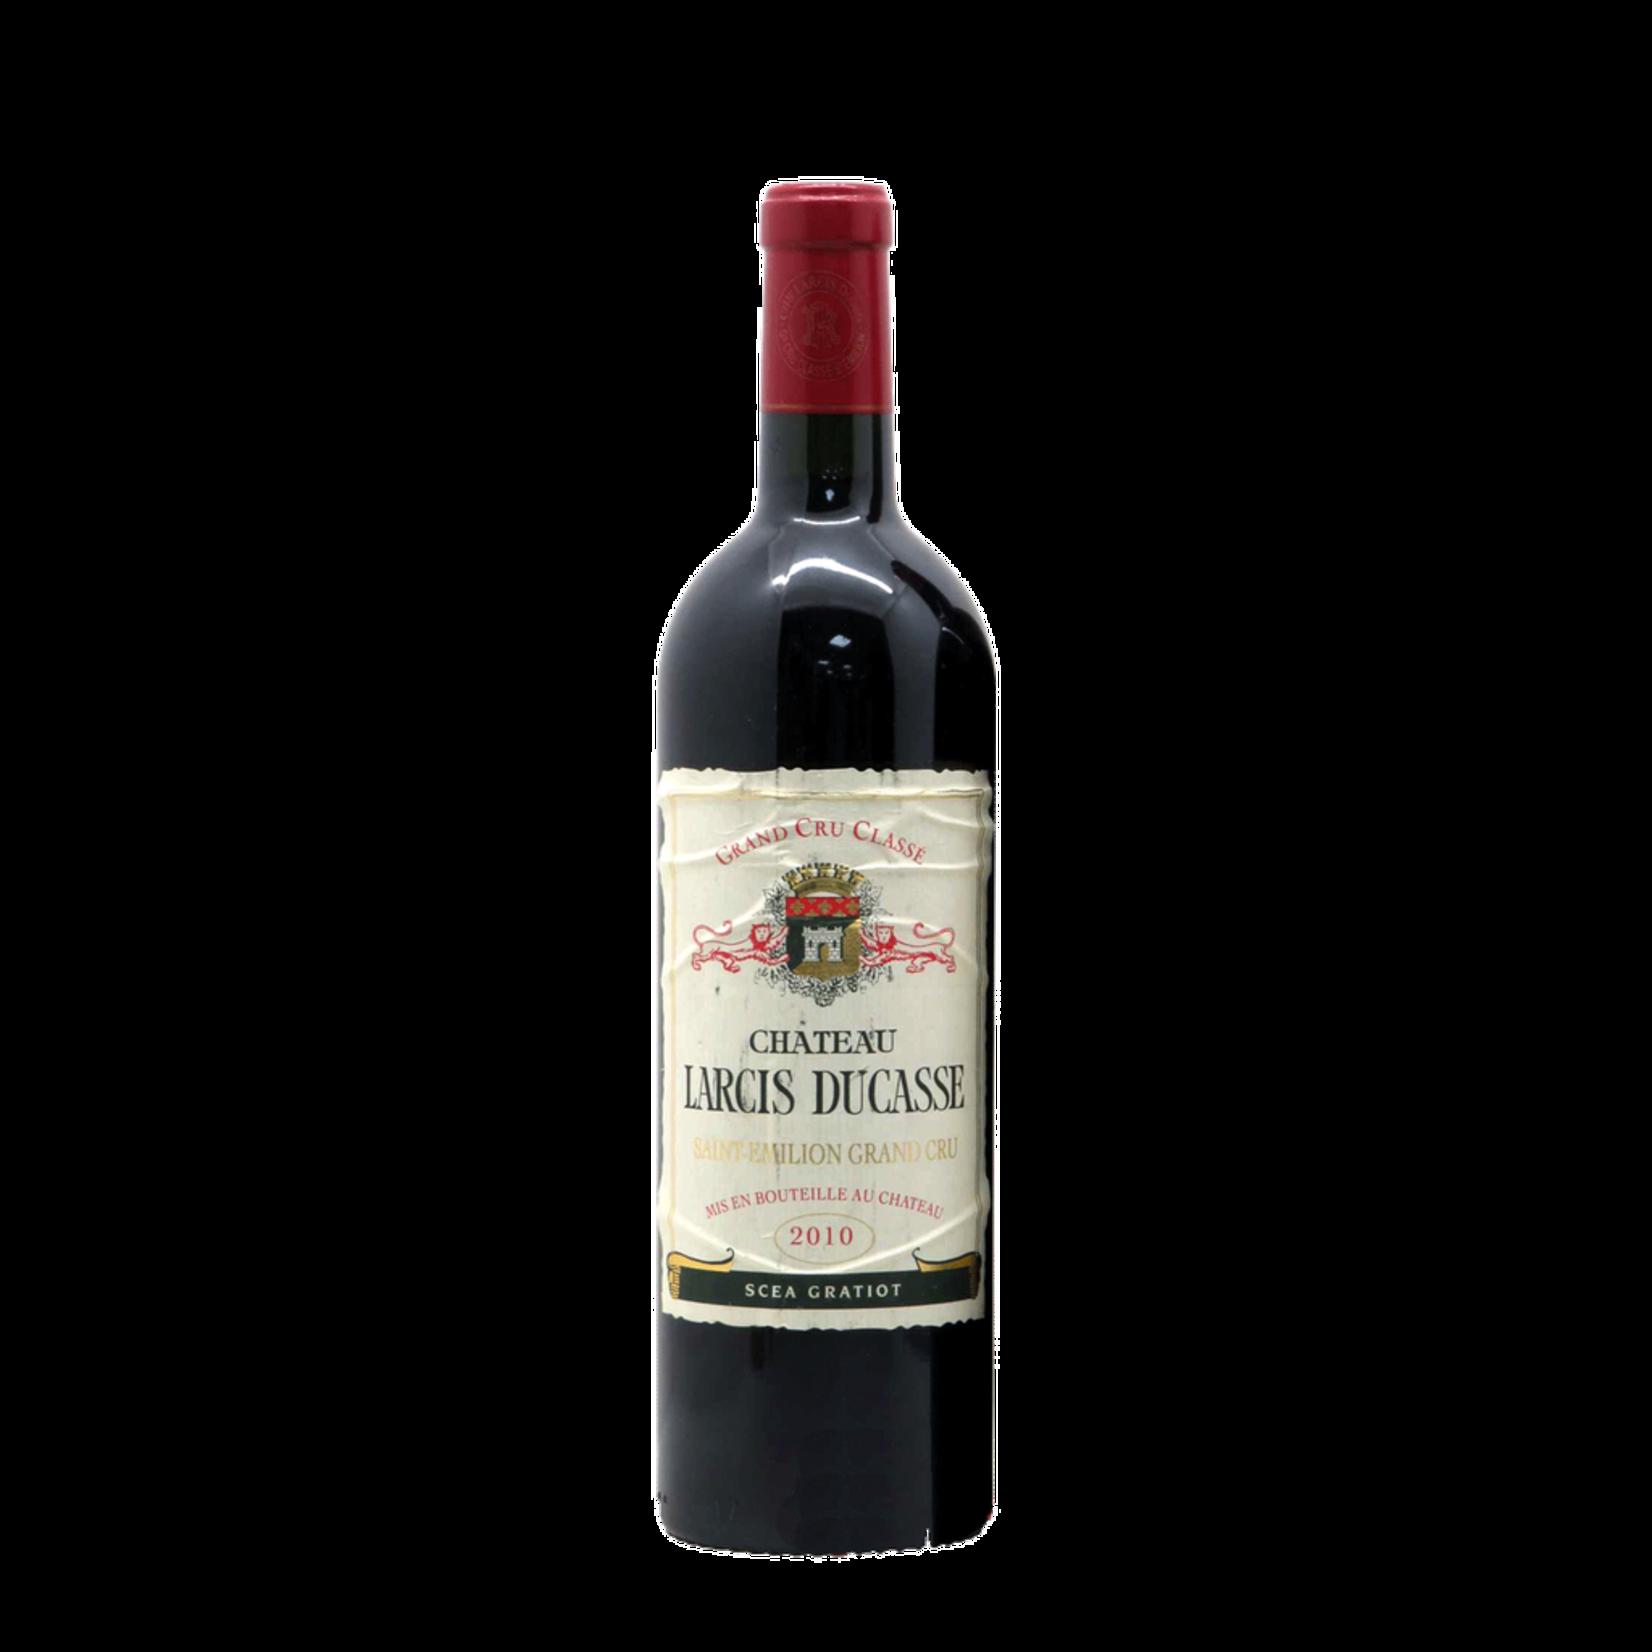 Wine Chateau Larcis Ducasse Saint Emilion Grand Cru Classe 2010